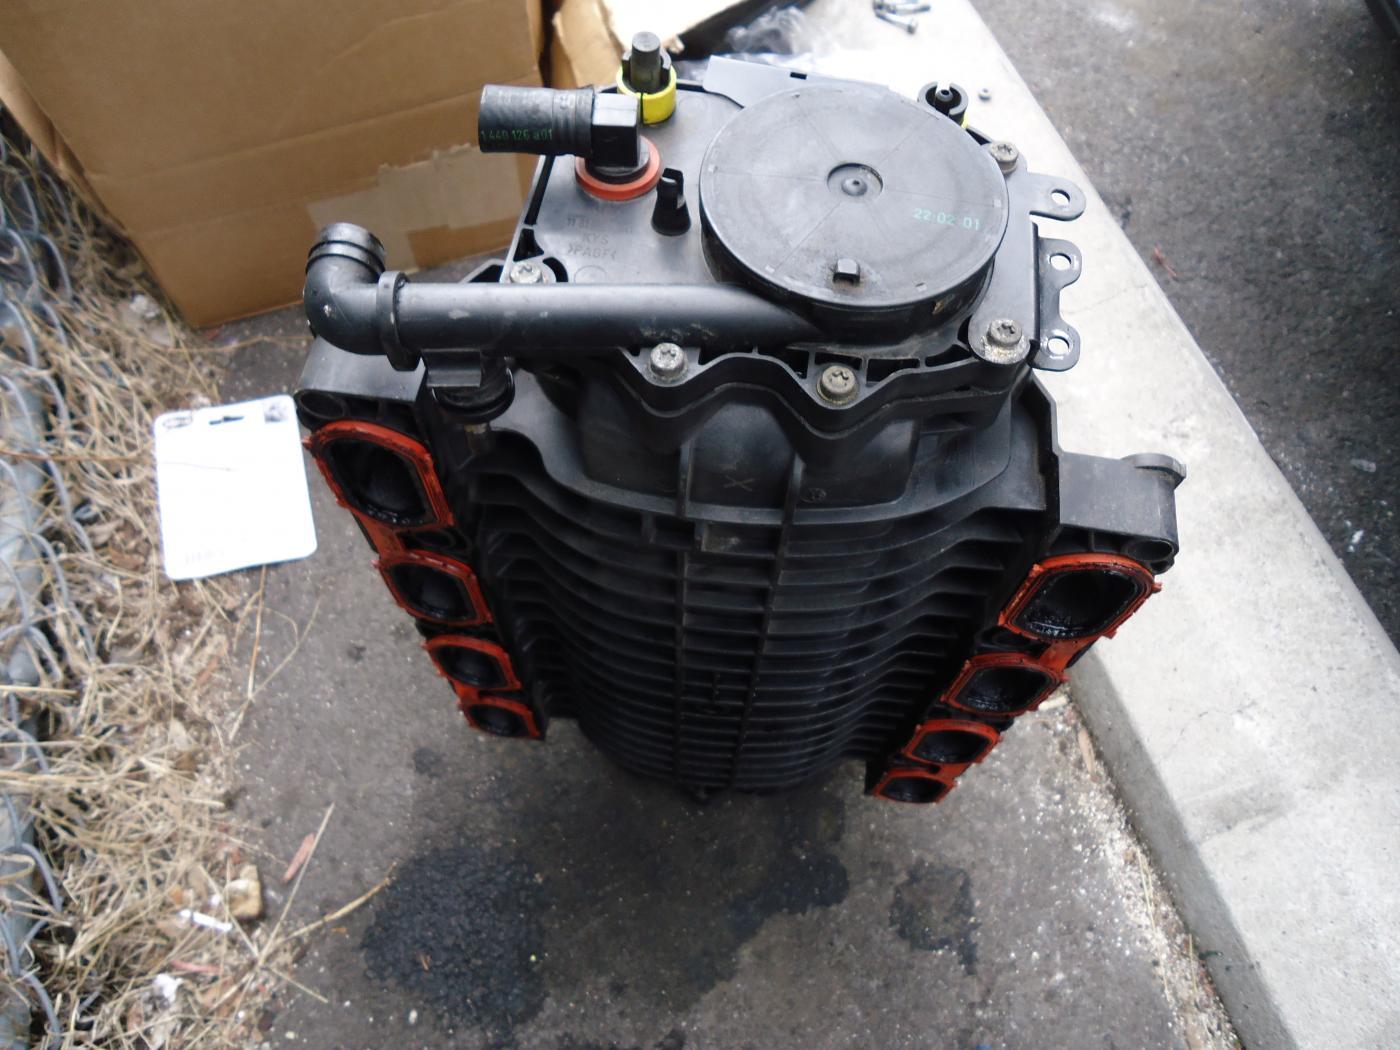 2004 X5 E53 Vacuum Line Bmw 2002 Engine Diagram Attached Images